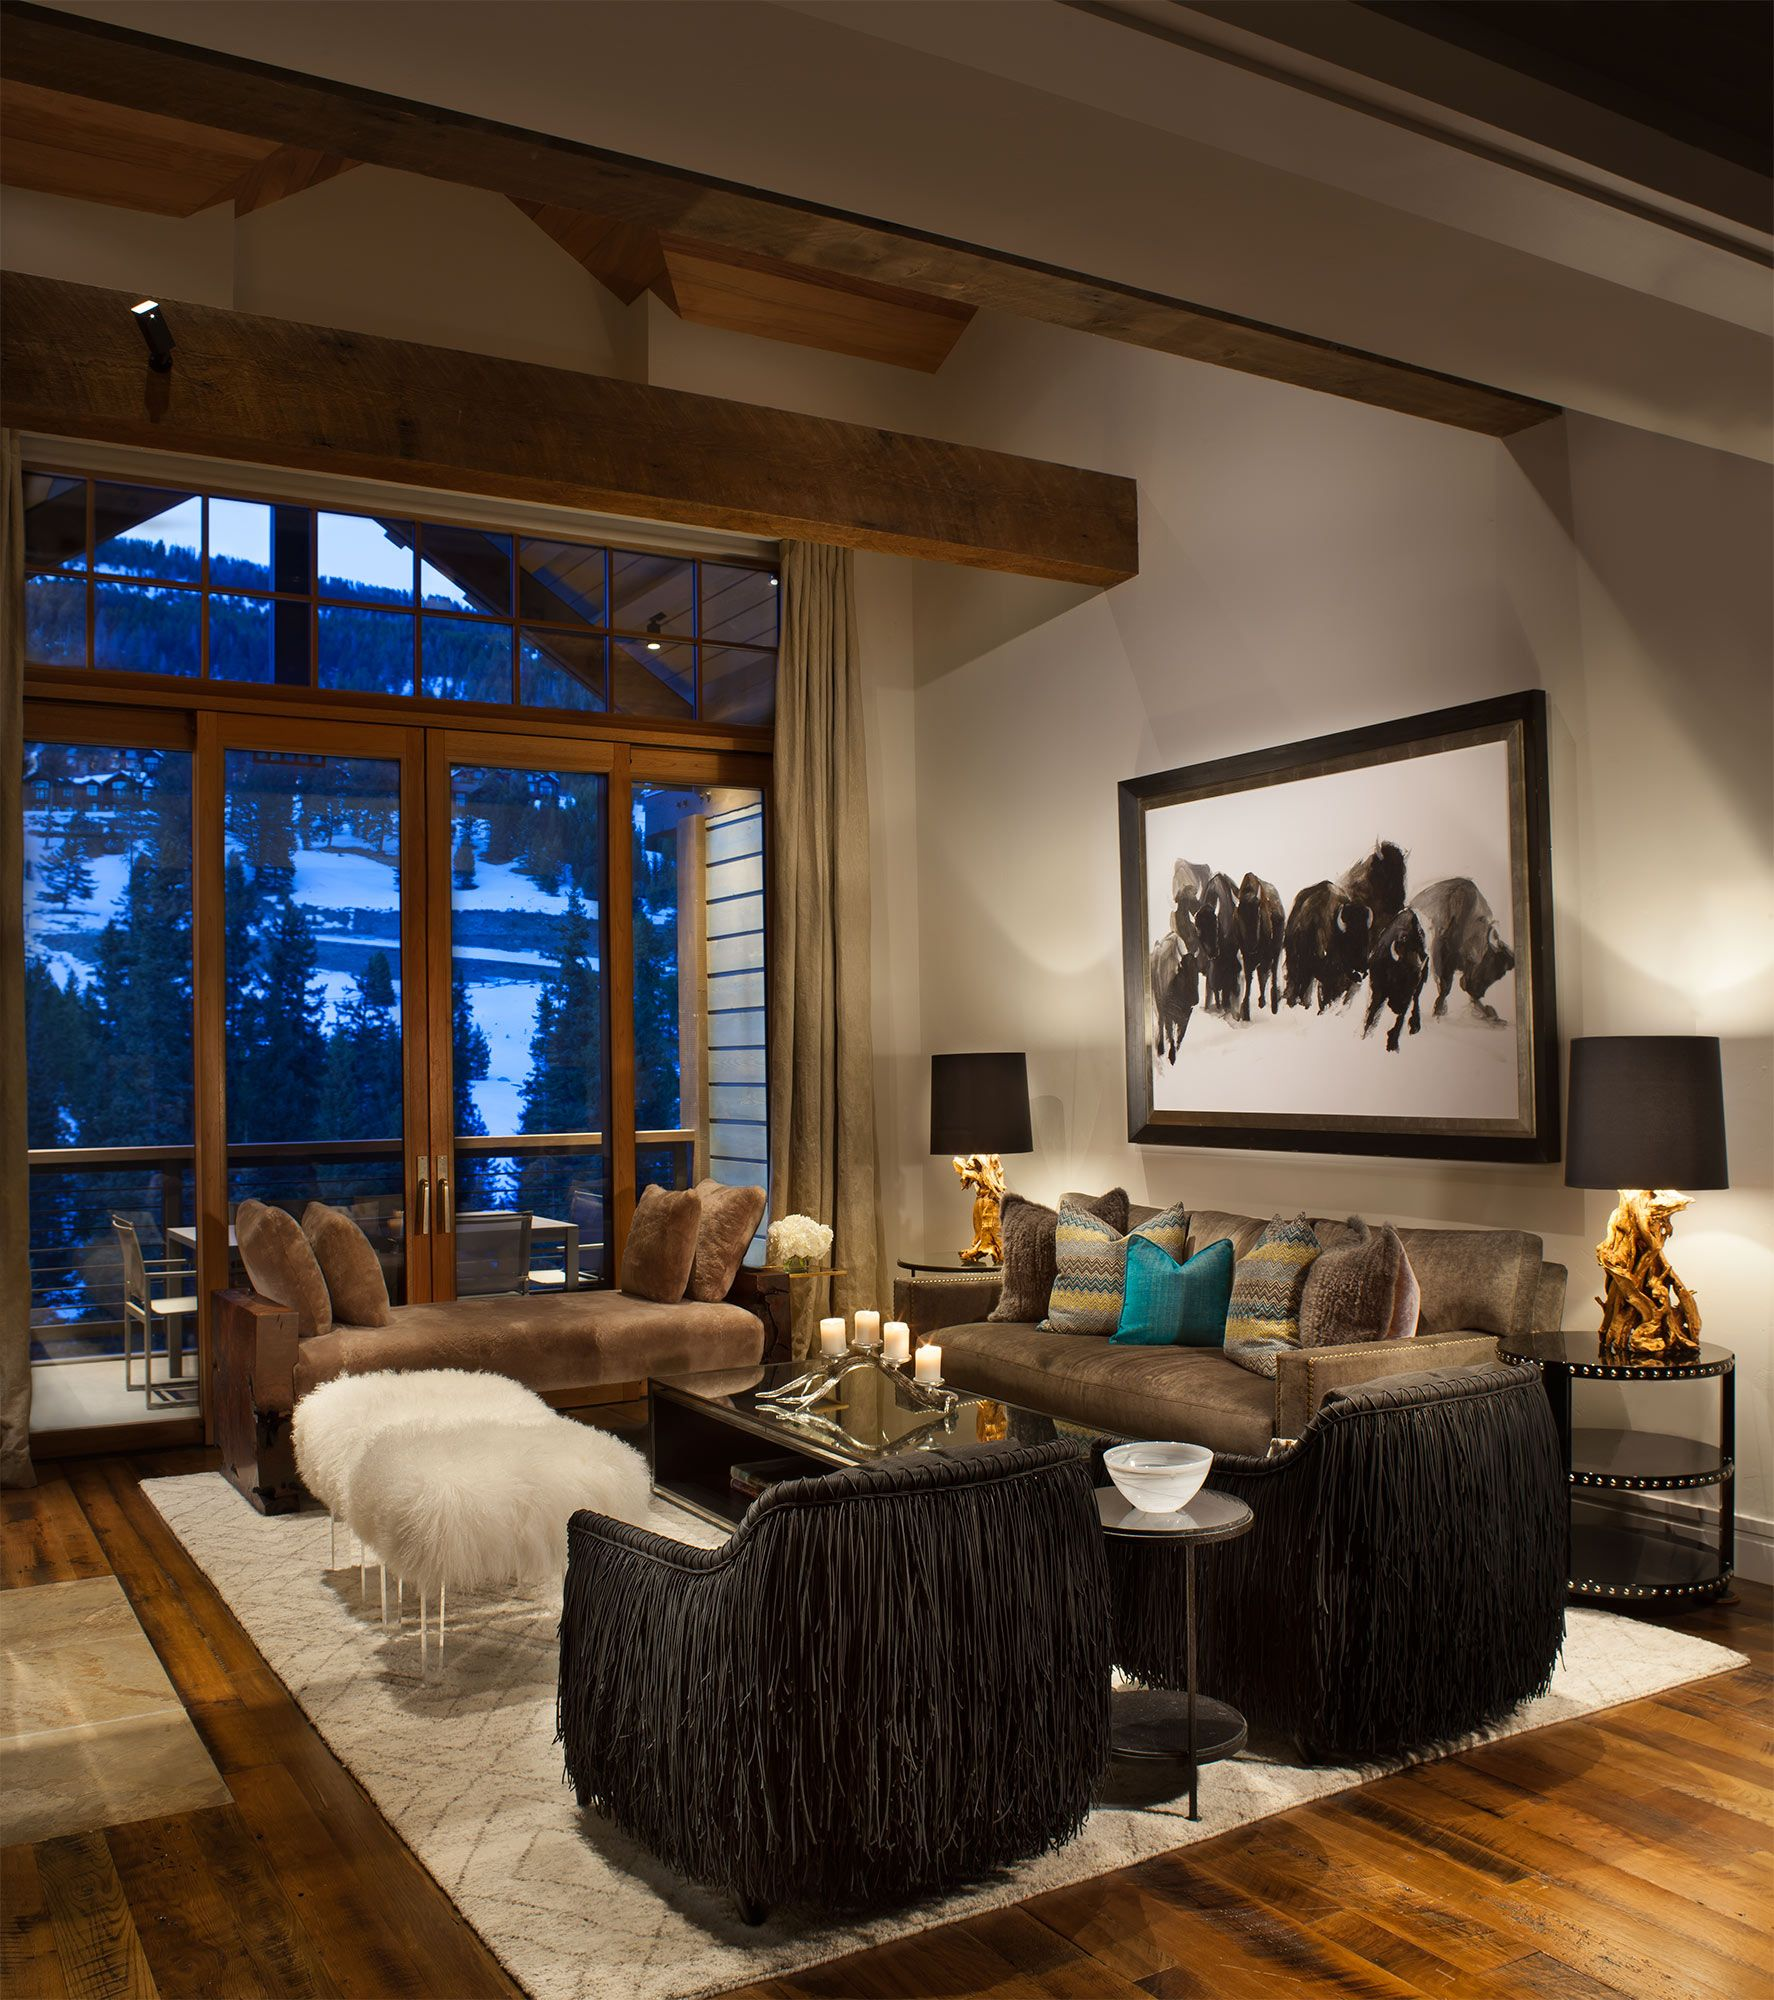 BISON HAUS | Interior Decoration Inspiration | Pinterest | Haus, Big ...